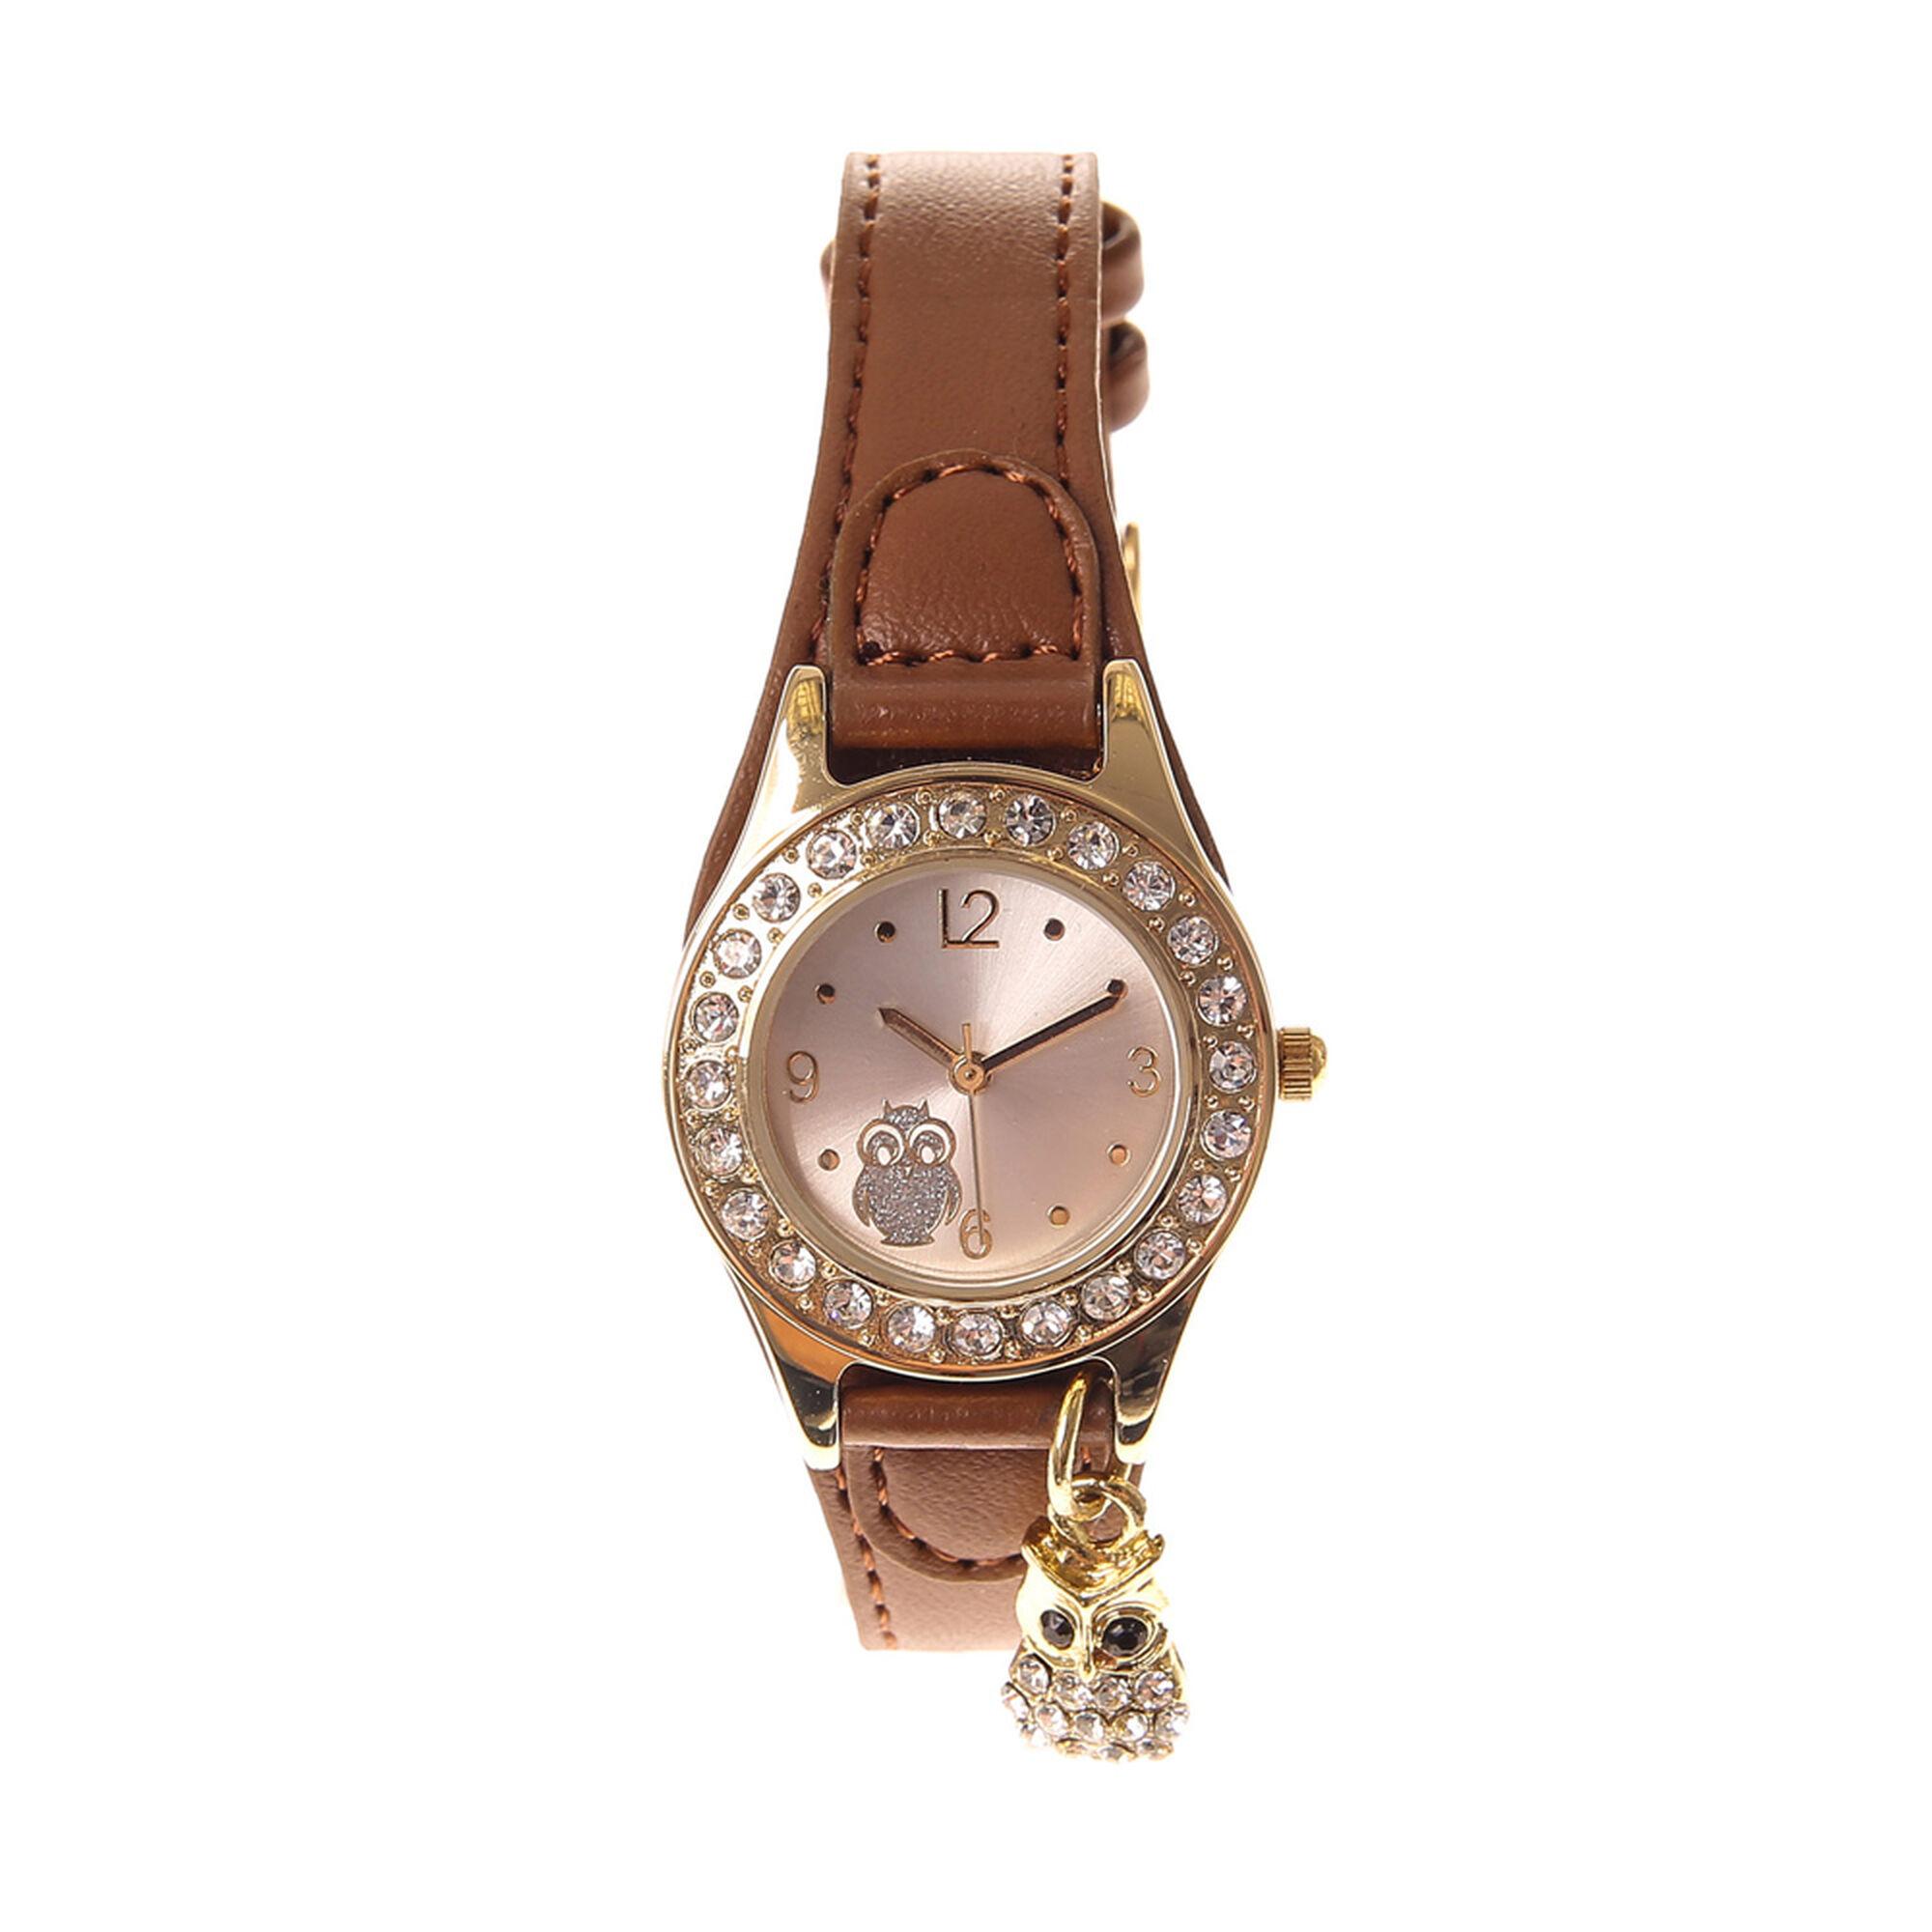 the black watch for copernik blinds kopernik pin wristwatch vintage raketa blind by ussr soviet leather serviced mens watches mechanical